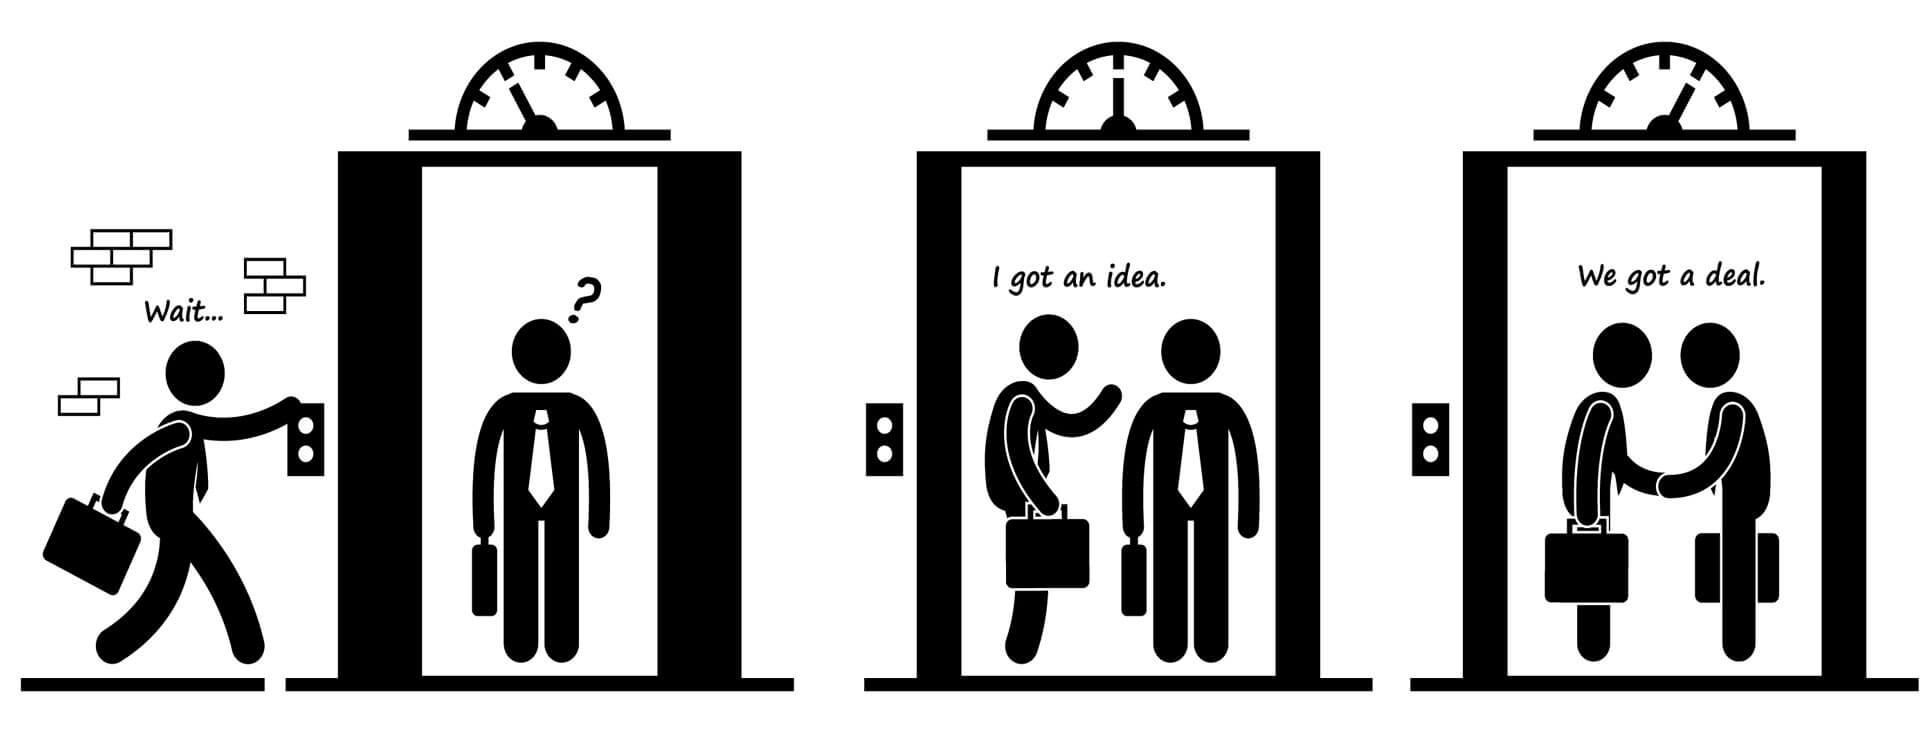 elevator-speech-e